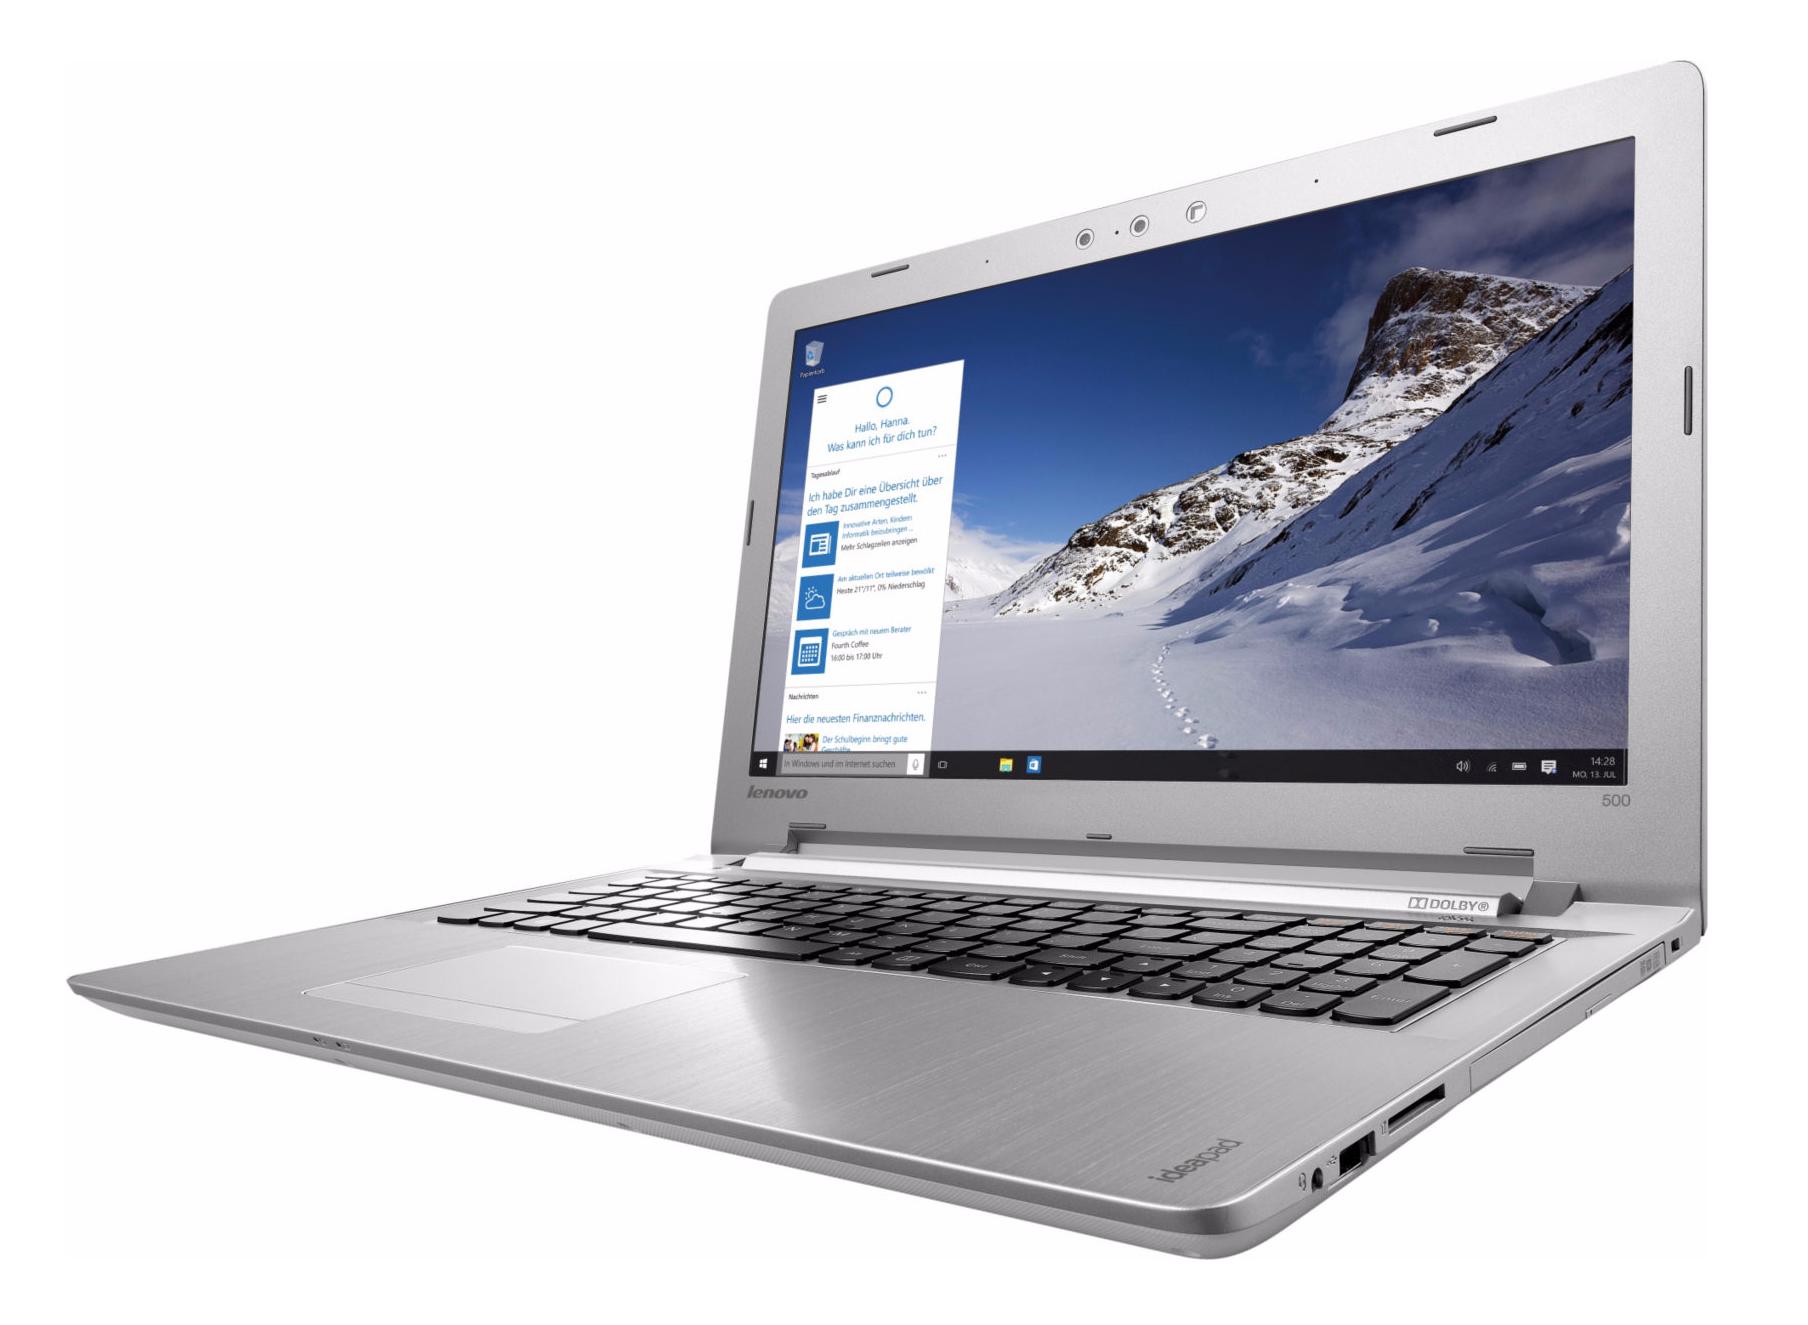 Test Lenovo Ideapad 500 15isk Notebook Notebookcheck Com